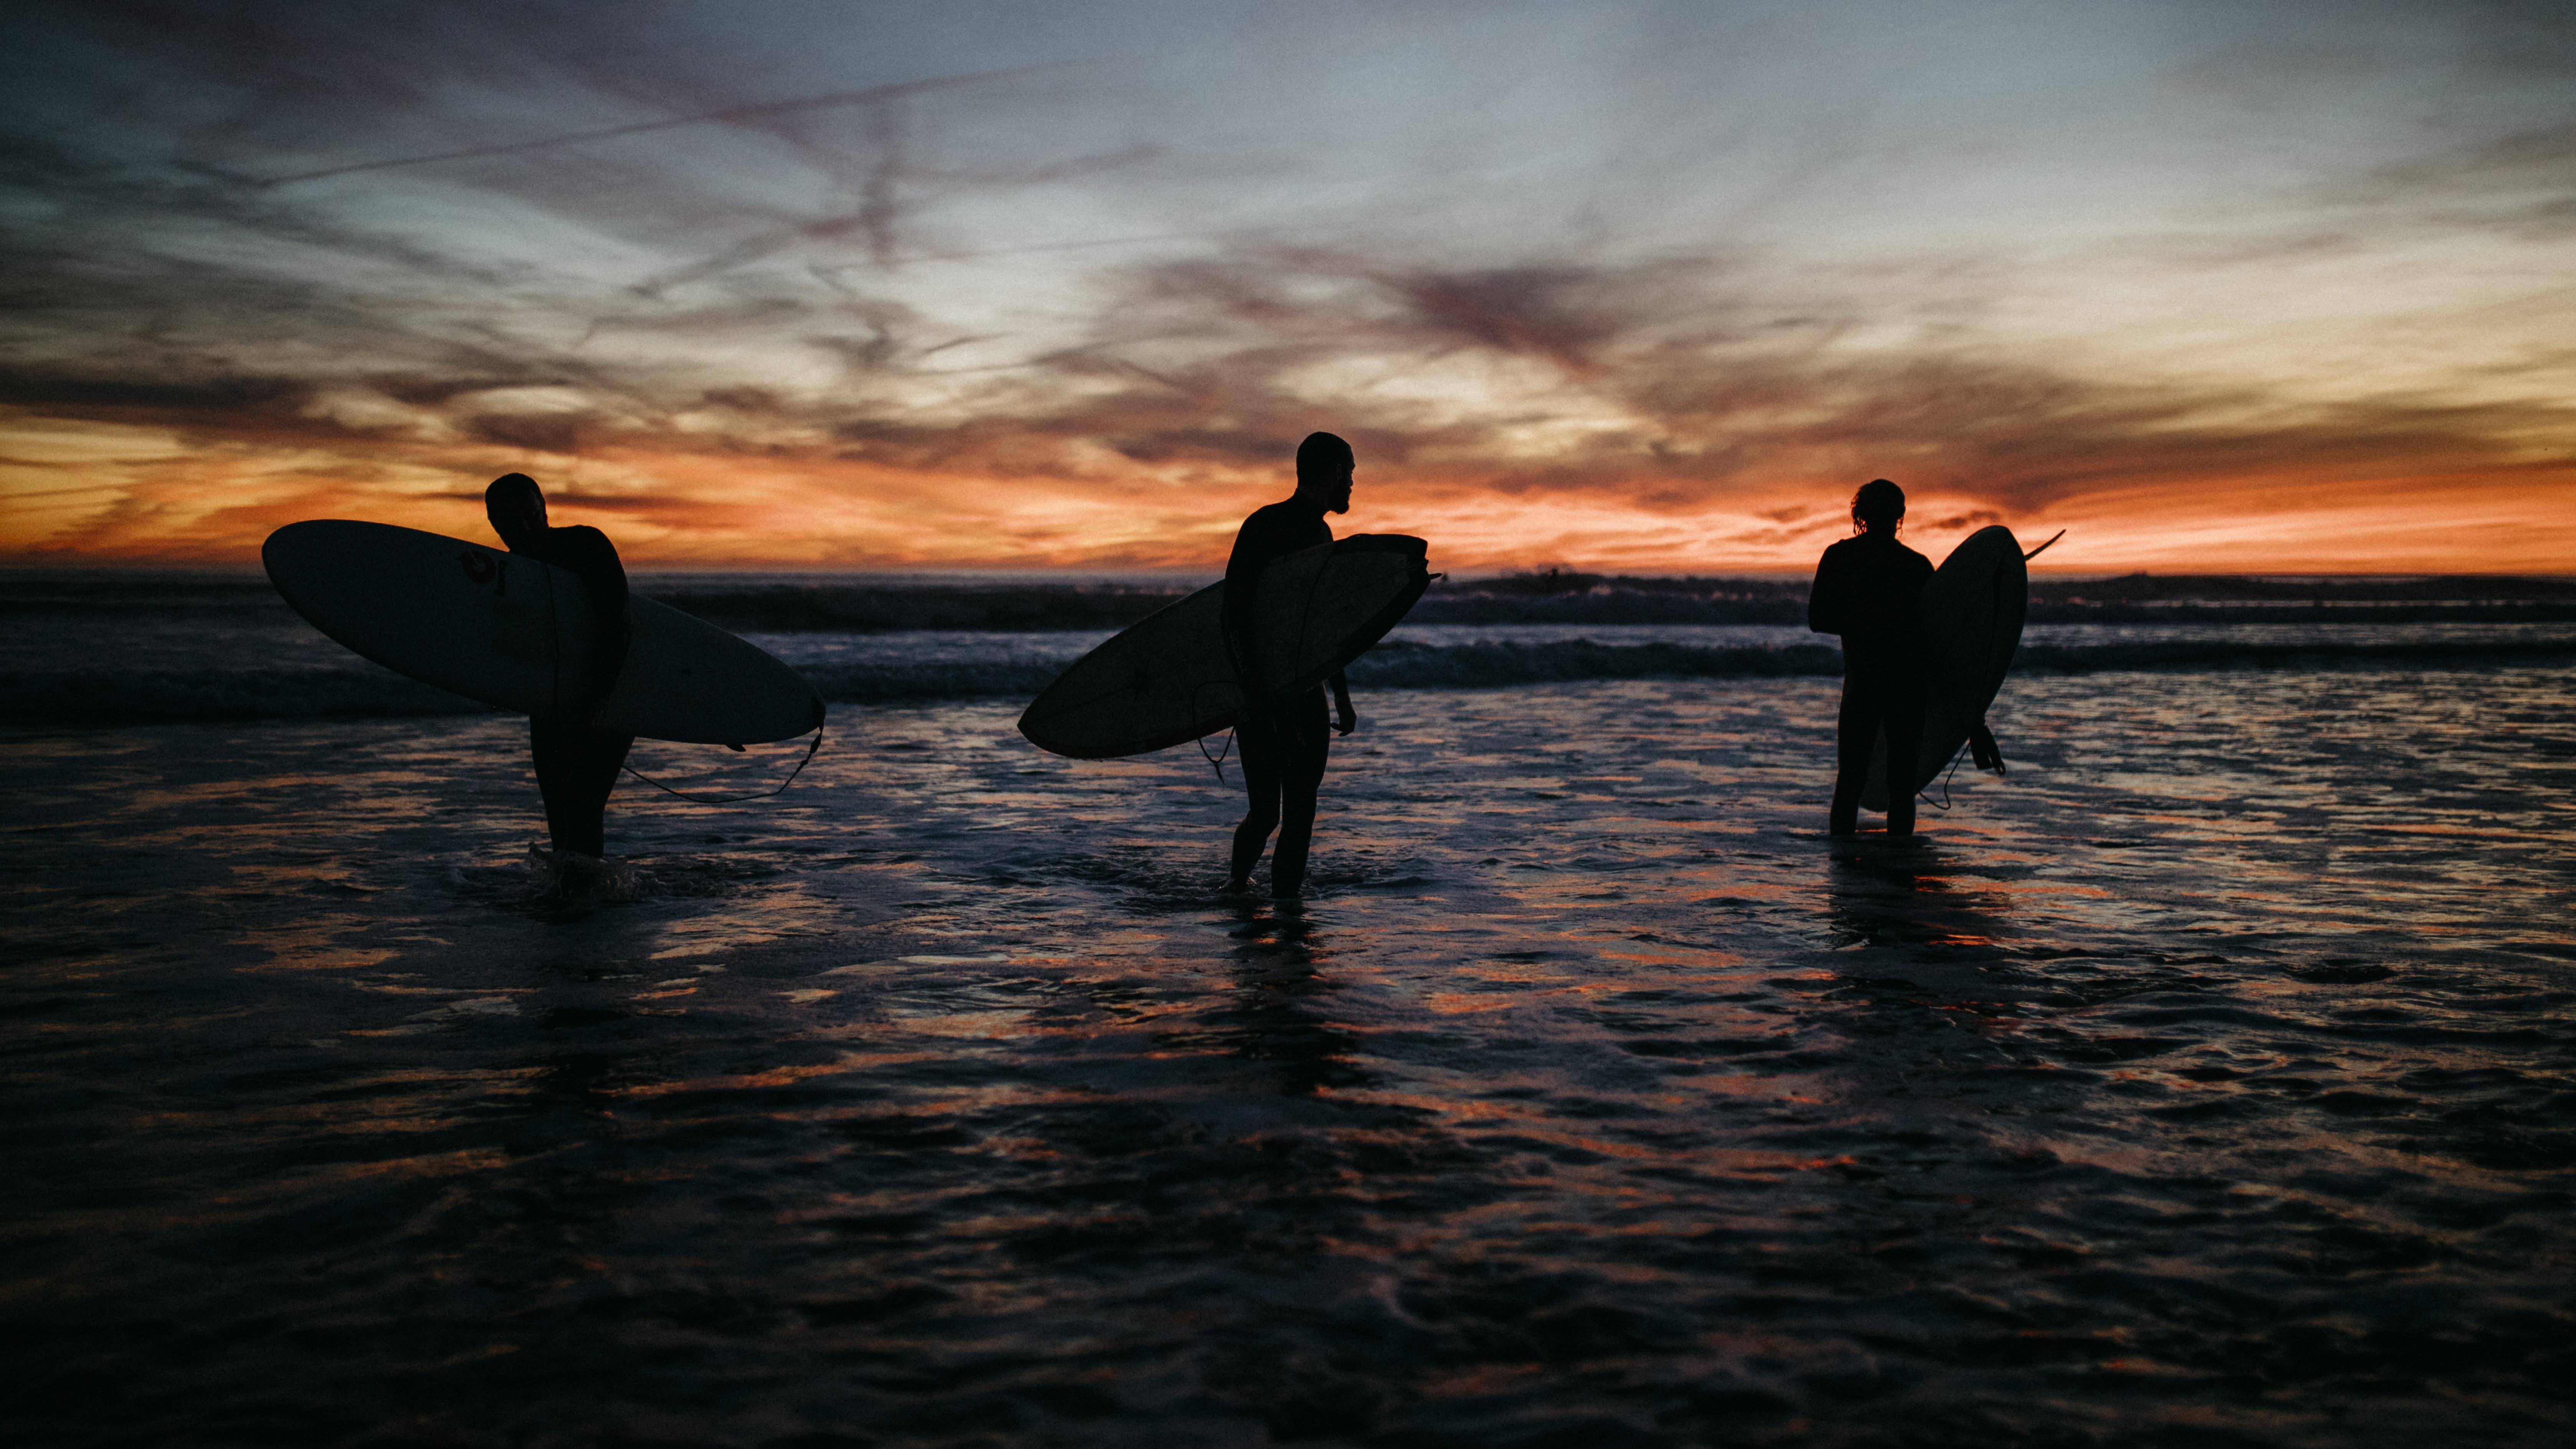 three people holding surf boards in ocean